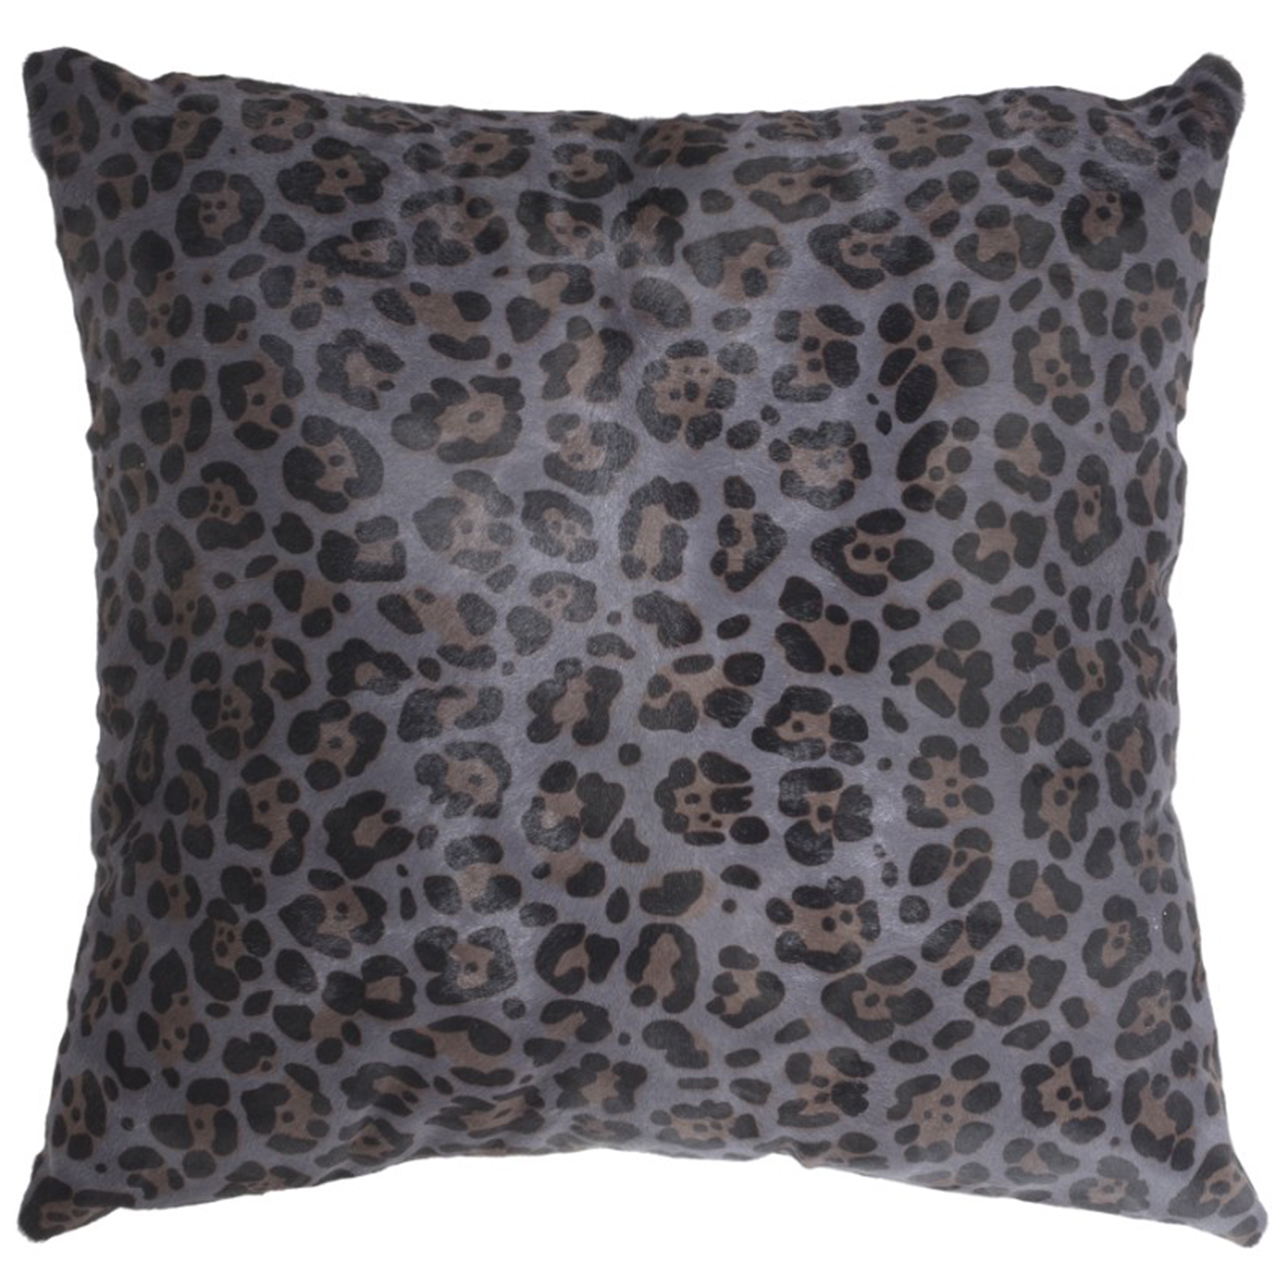 NEW-Cavallino Pillow- Leopard 1055-493- 50x50cm (CPLEO1055493BL5050) - ANVOGG FEEL SHEARLING | ANVOGG